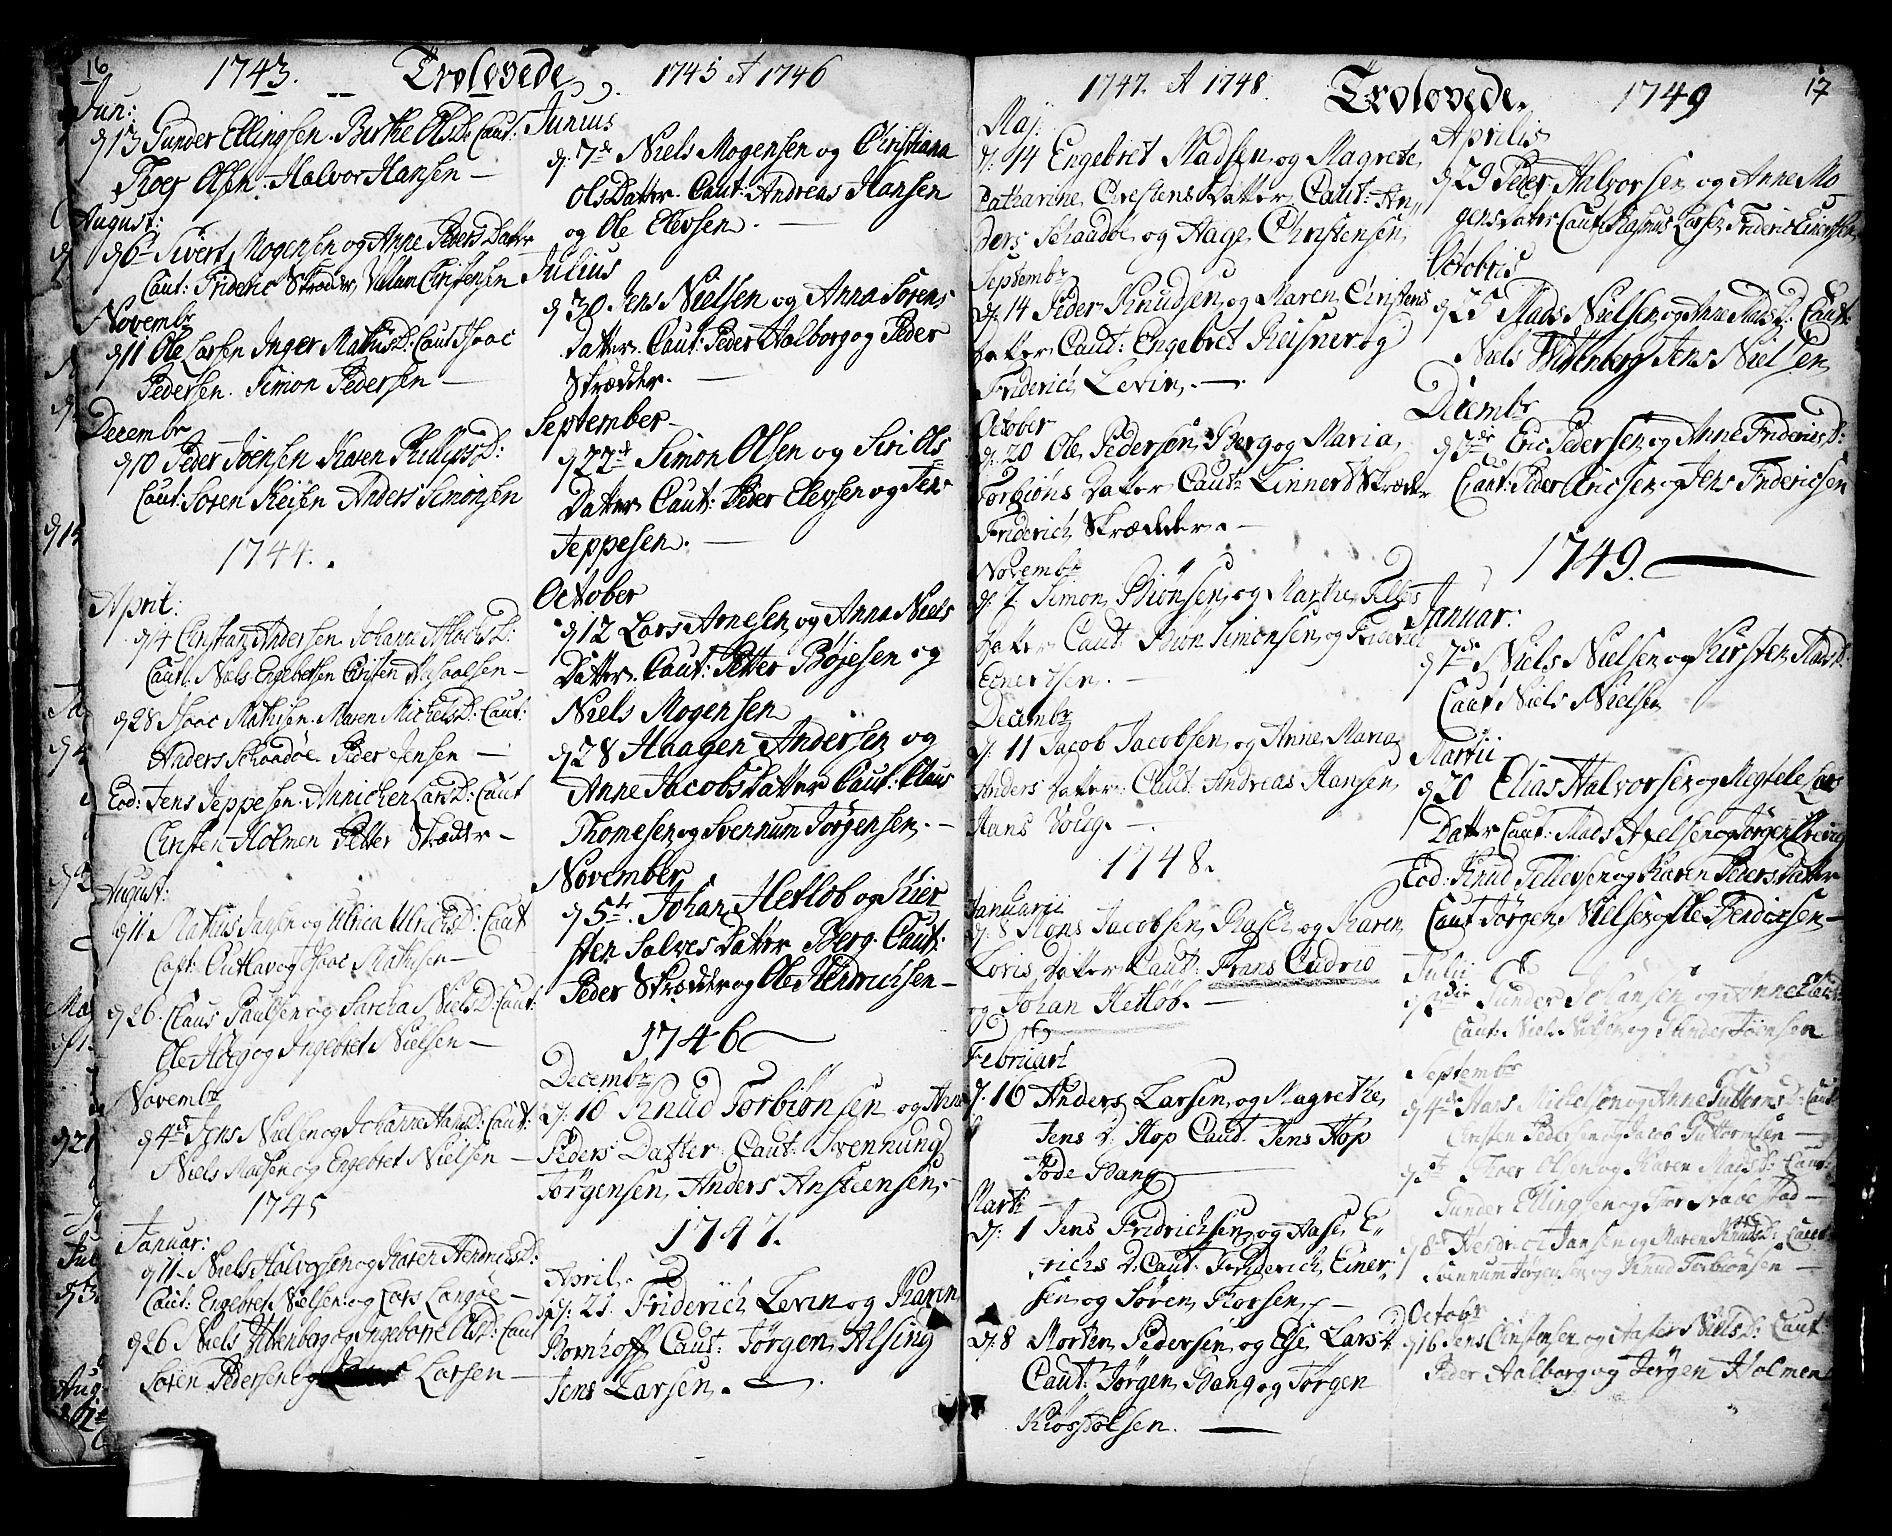 SAKO, Kragerø kirkebøker, F/Fa/L0001: Ministerialbok nr. 1, 1702-1766, s. 16-17